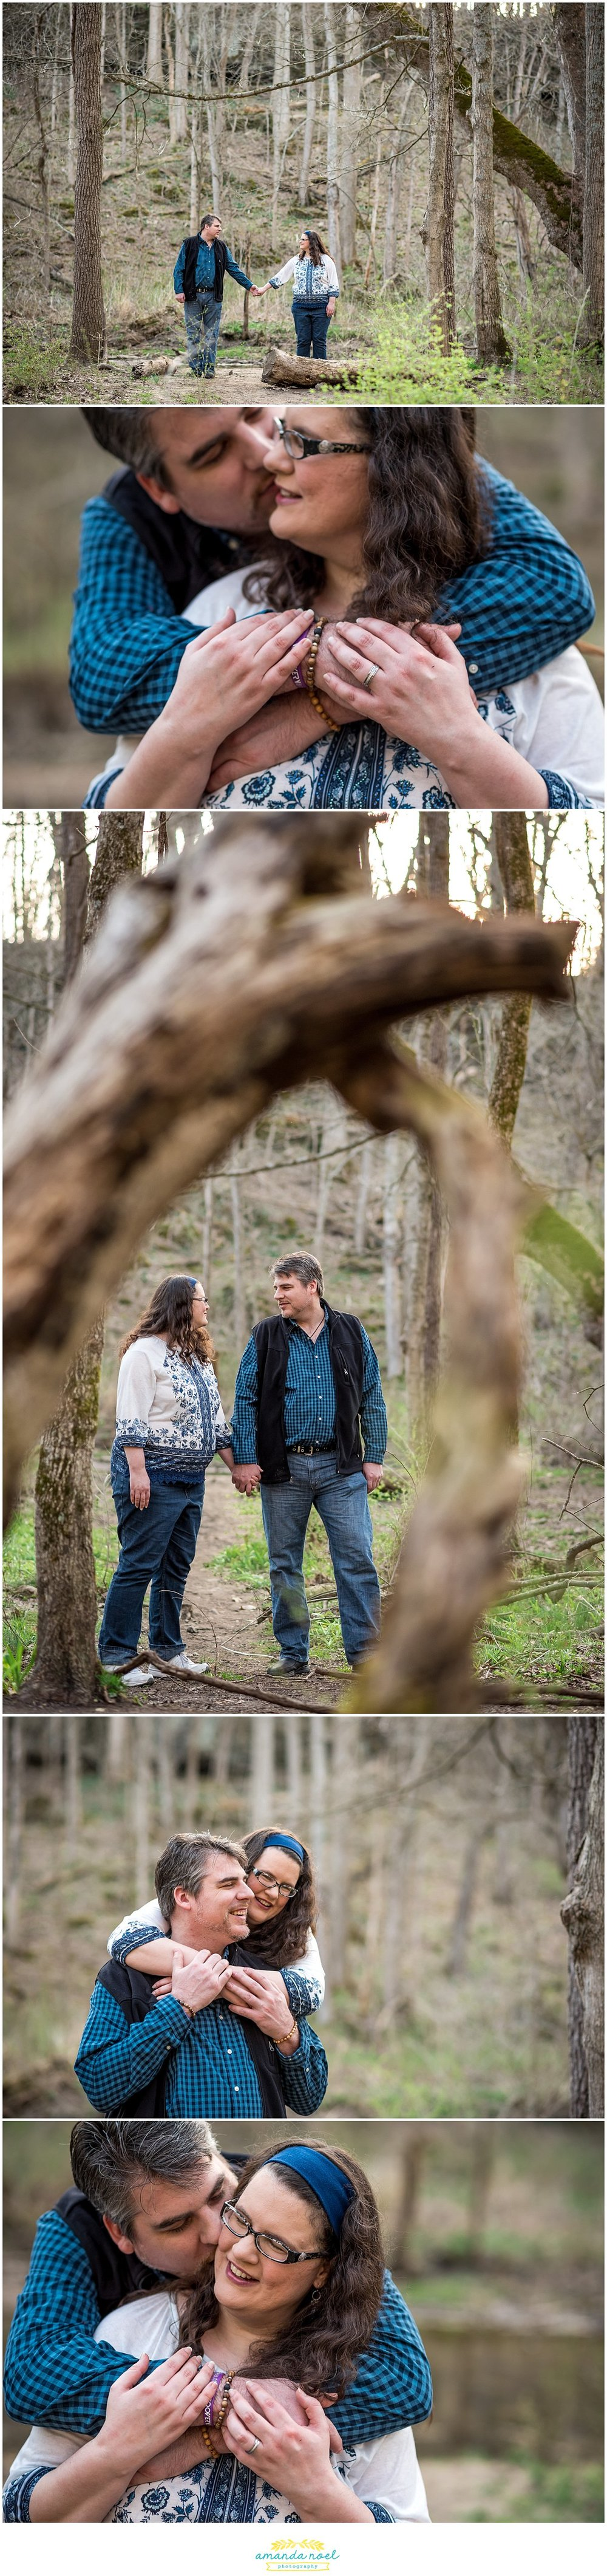 Dayton Wedding photographer | natural engagement session in the woods | Amanda Noel Photography